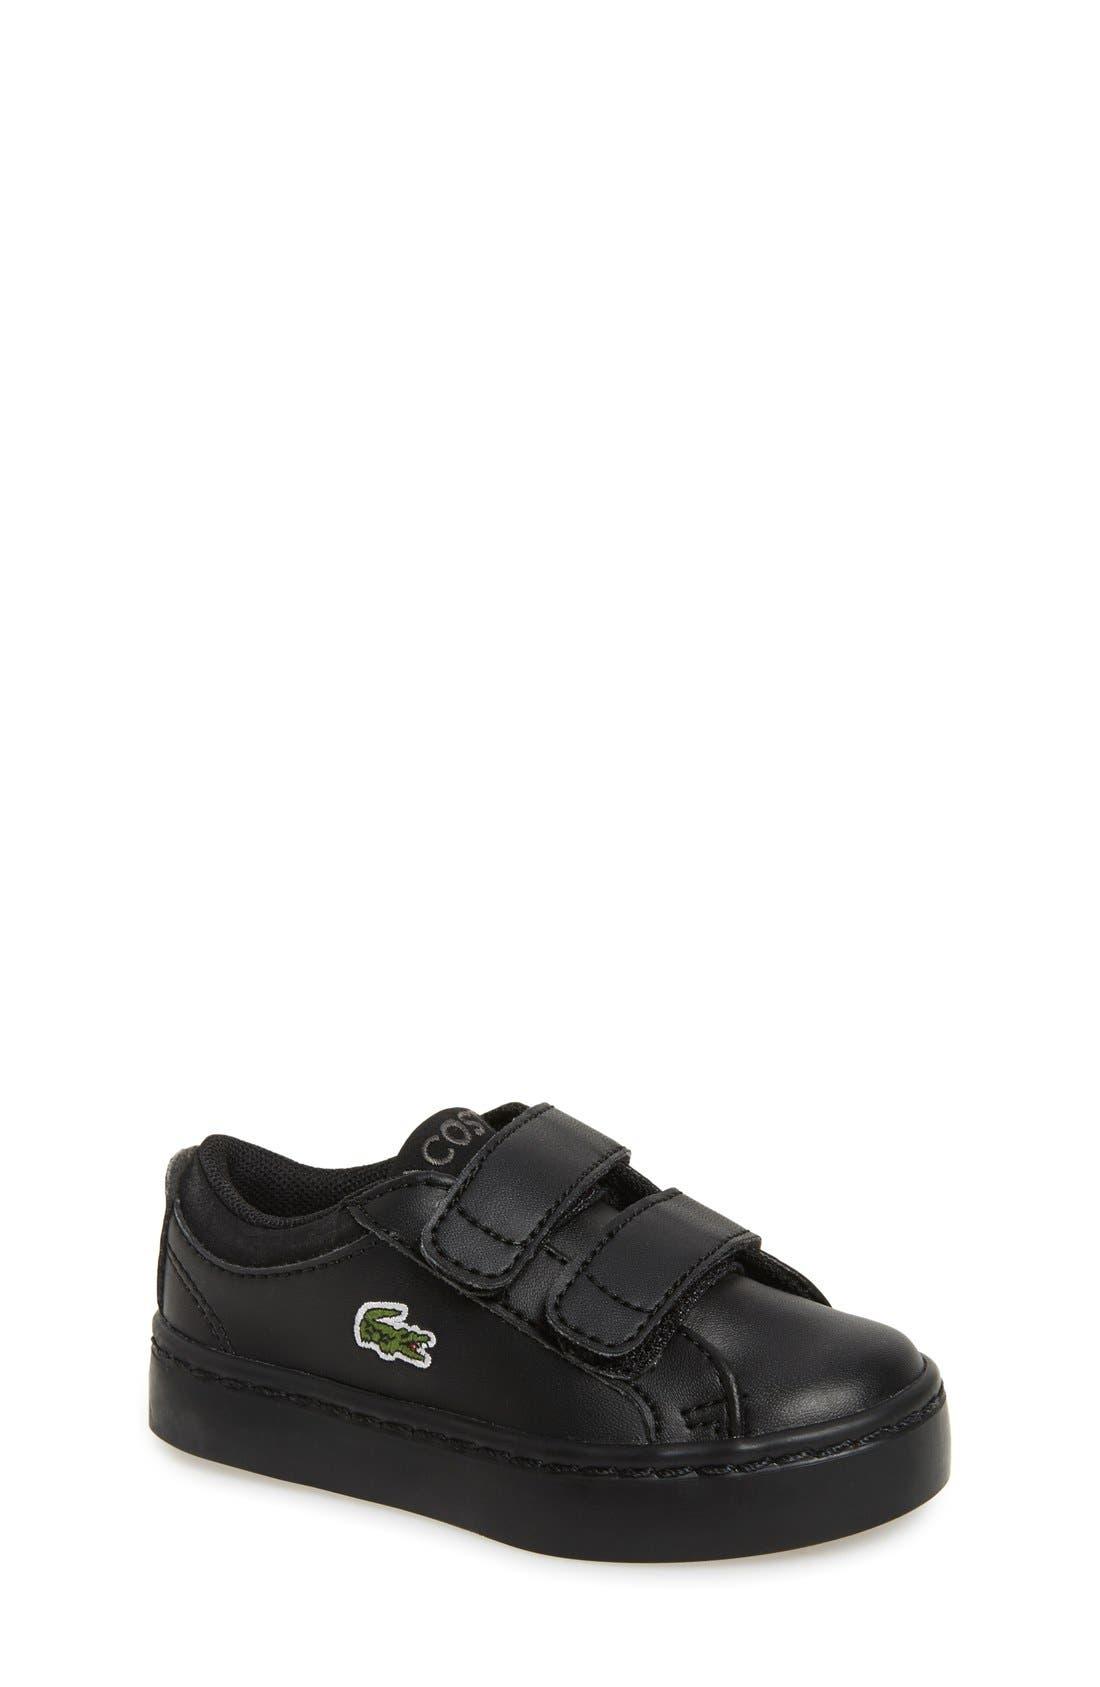 Alternate Image 1 Selected - Lacoste 'Straightset' Sneaker (Baby, Walker & Toddler)